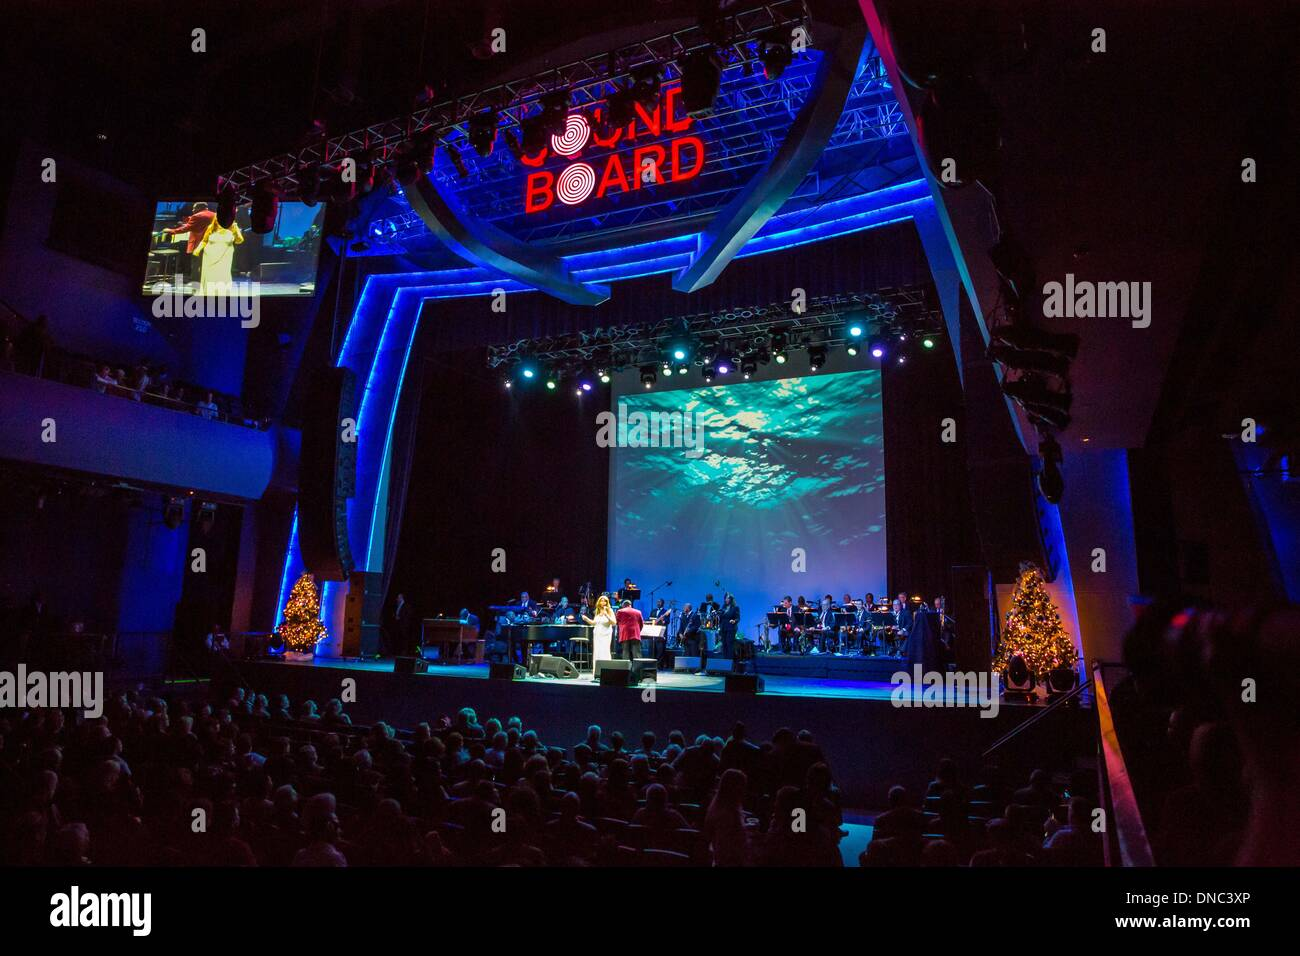 Detroit, Michigan, USA  21st Dec, 2013  Motown Legend ARETHA